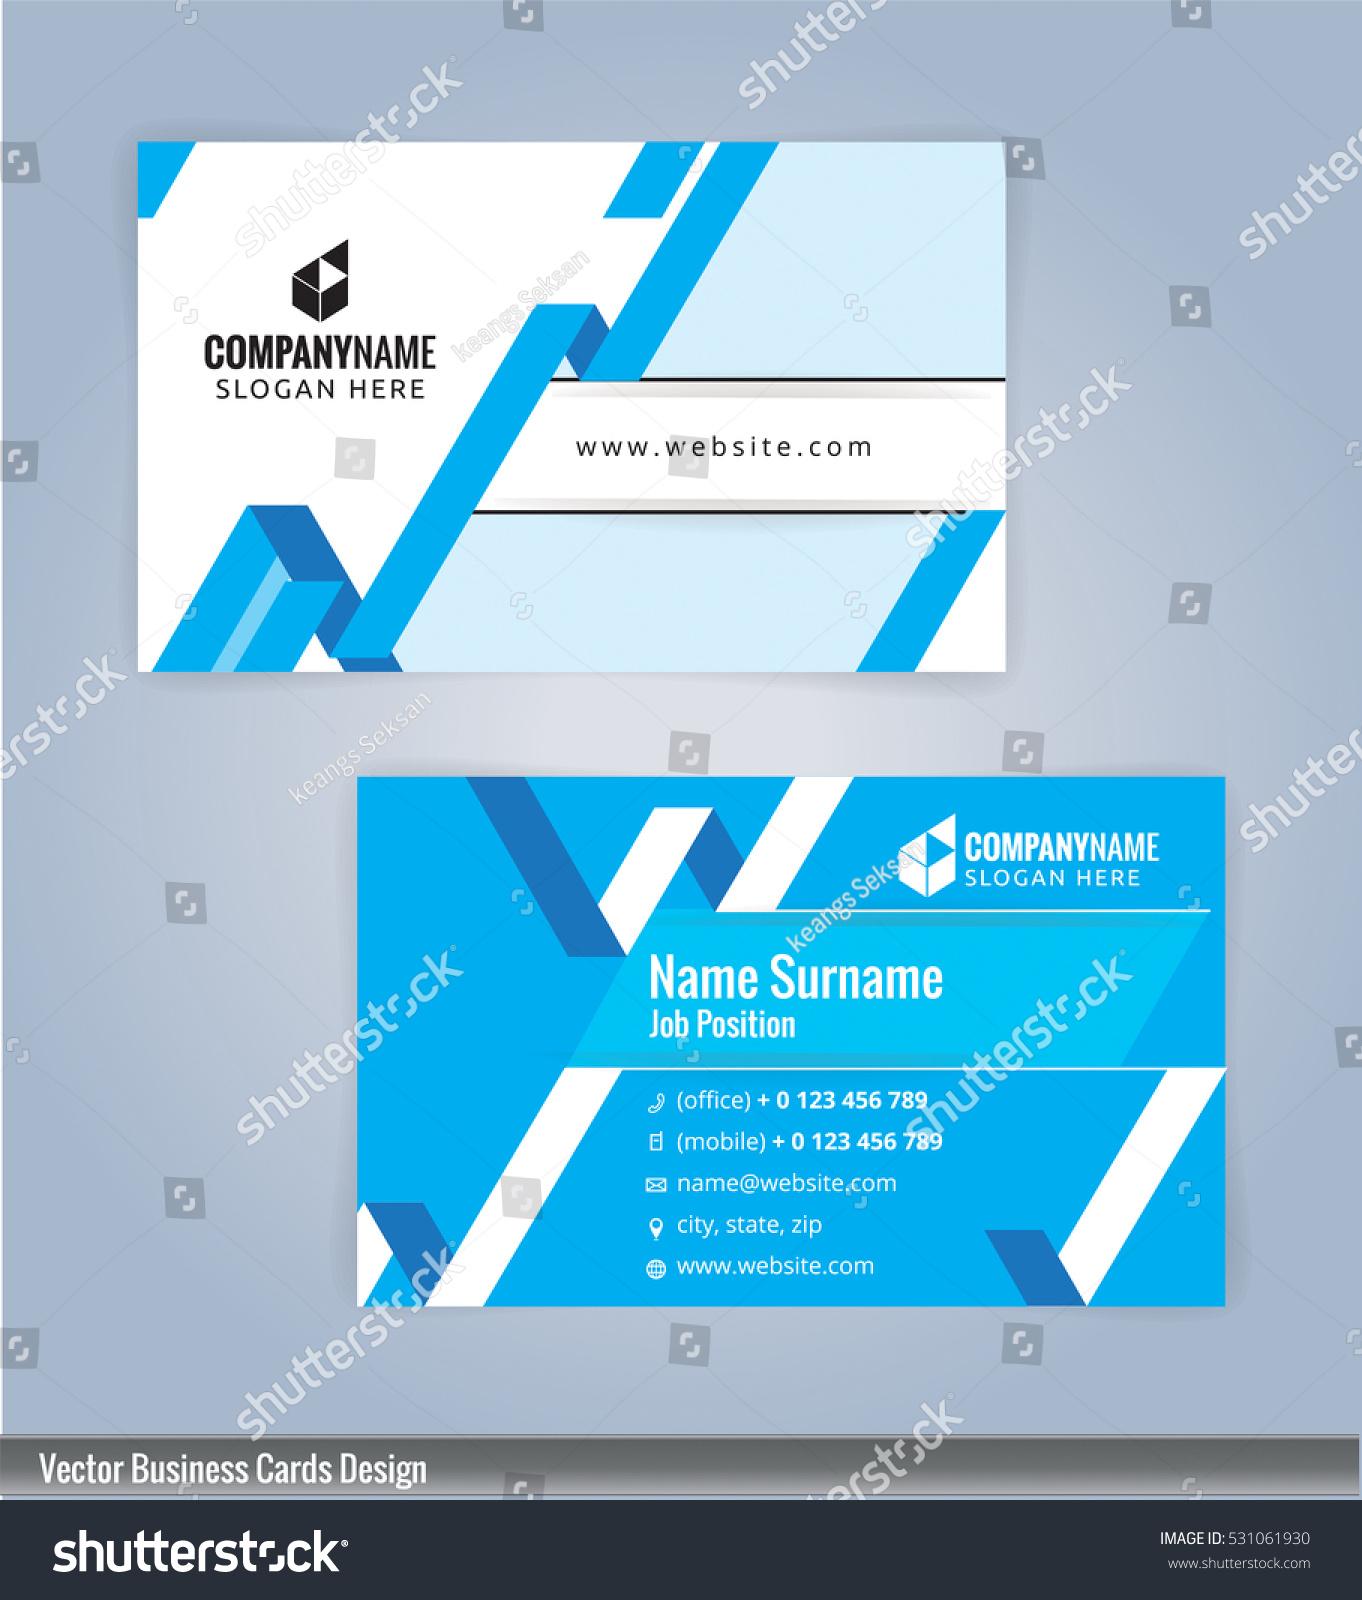 Modern Creative Clean Business Card Design Stock Vector 531061930 ...